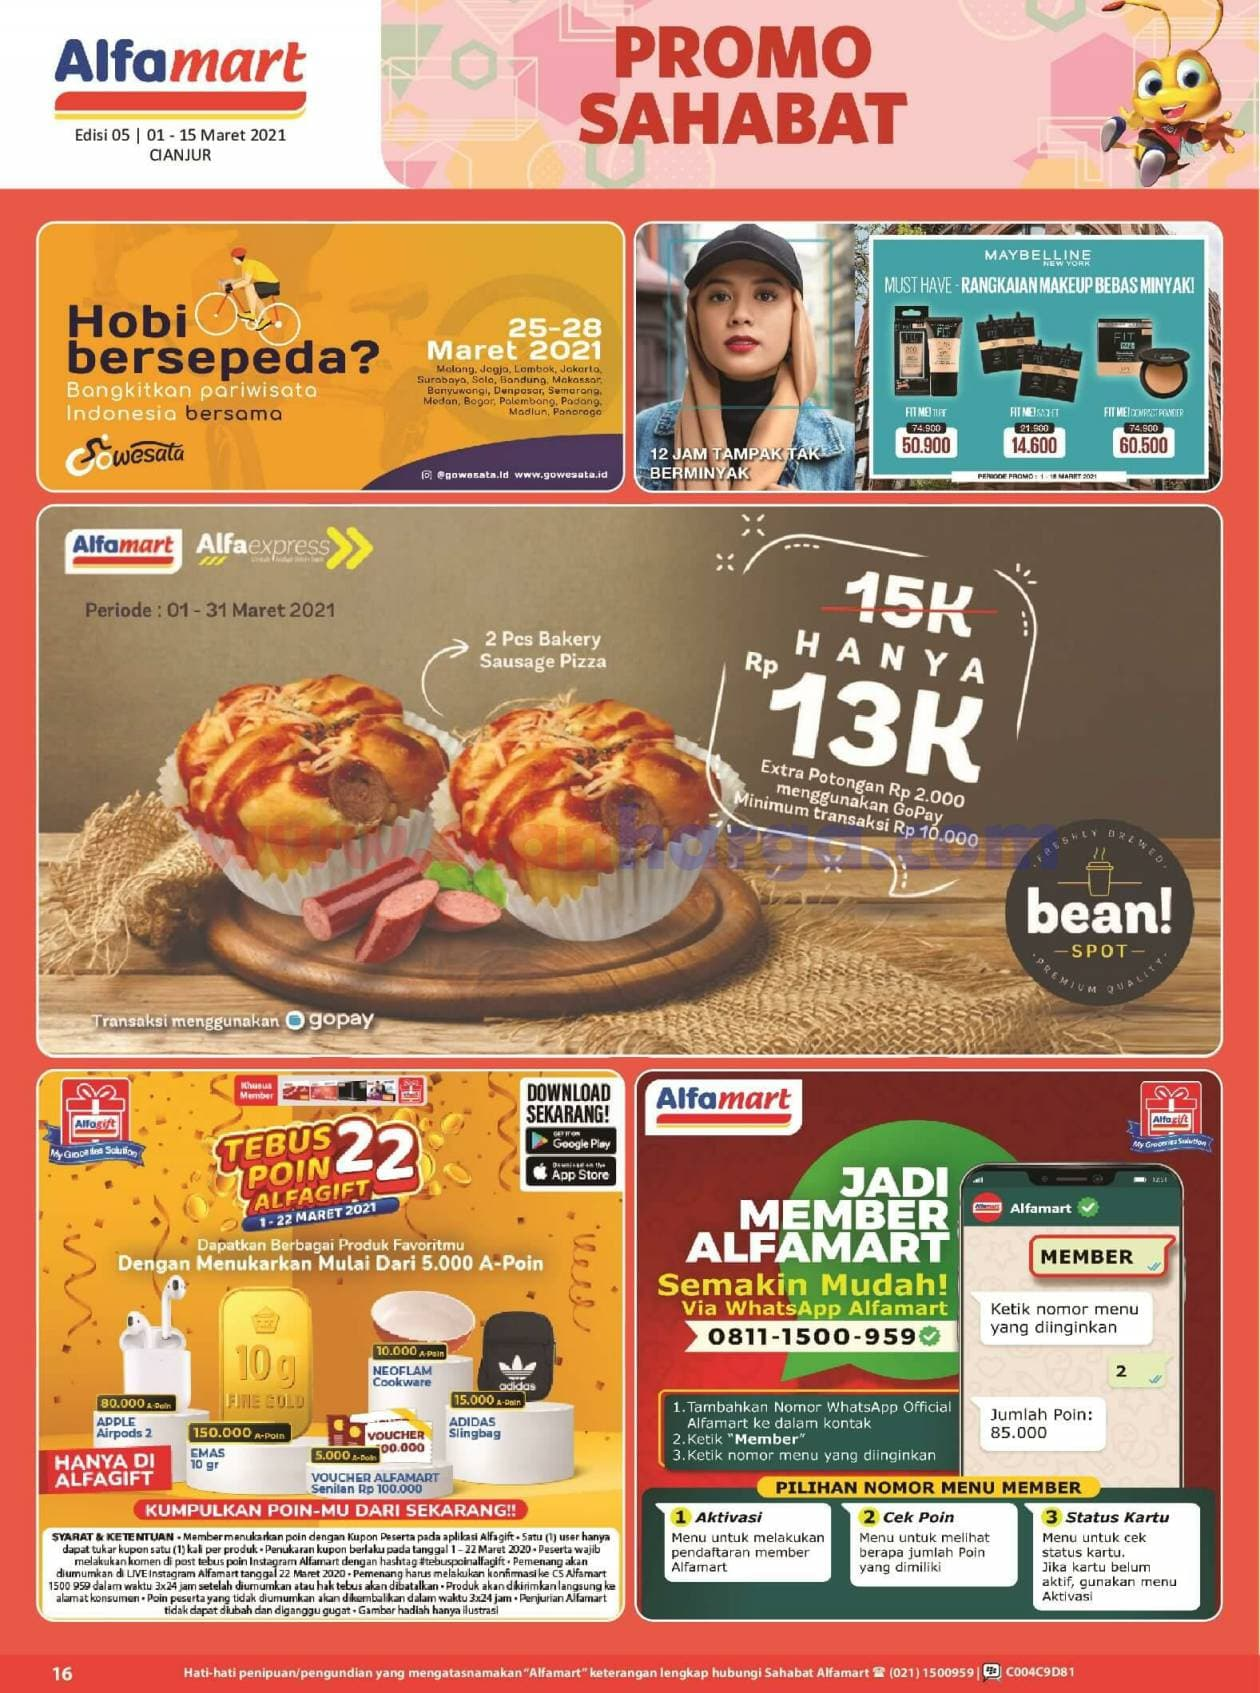 Katalog Promo Alfamart 1 - 15 Maret 2021 16